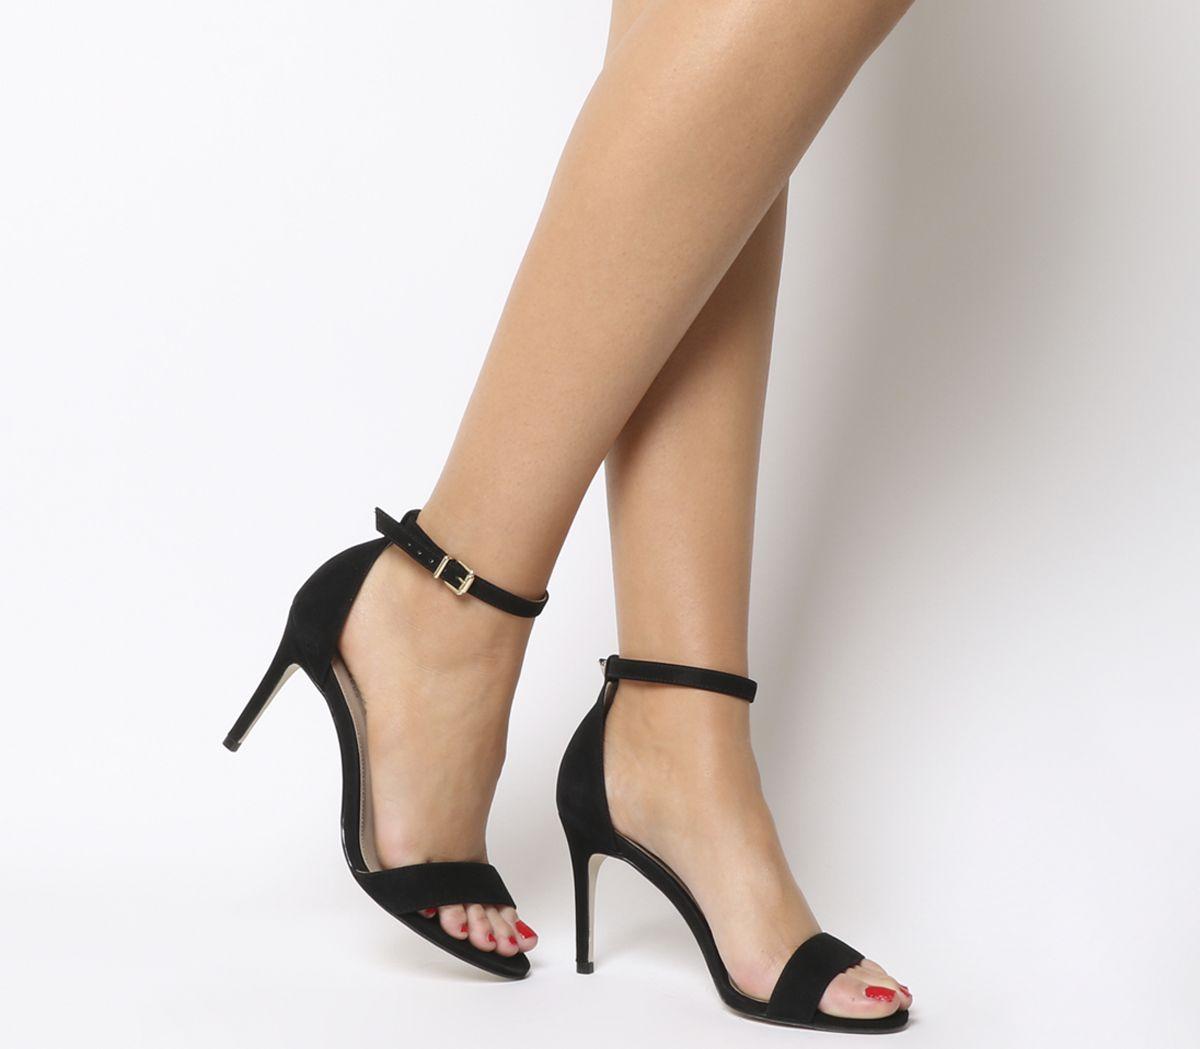 e583528e9bb Office Mimosa Two Part Mid Sandals Black Nubuck - Mid Heels